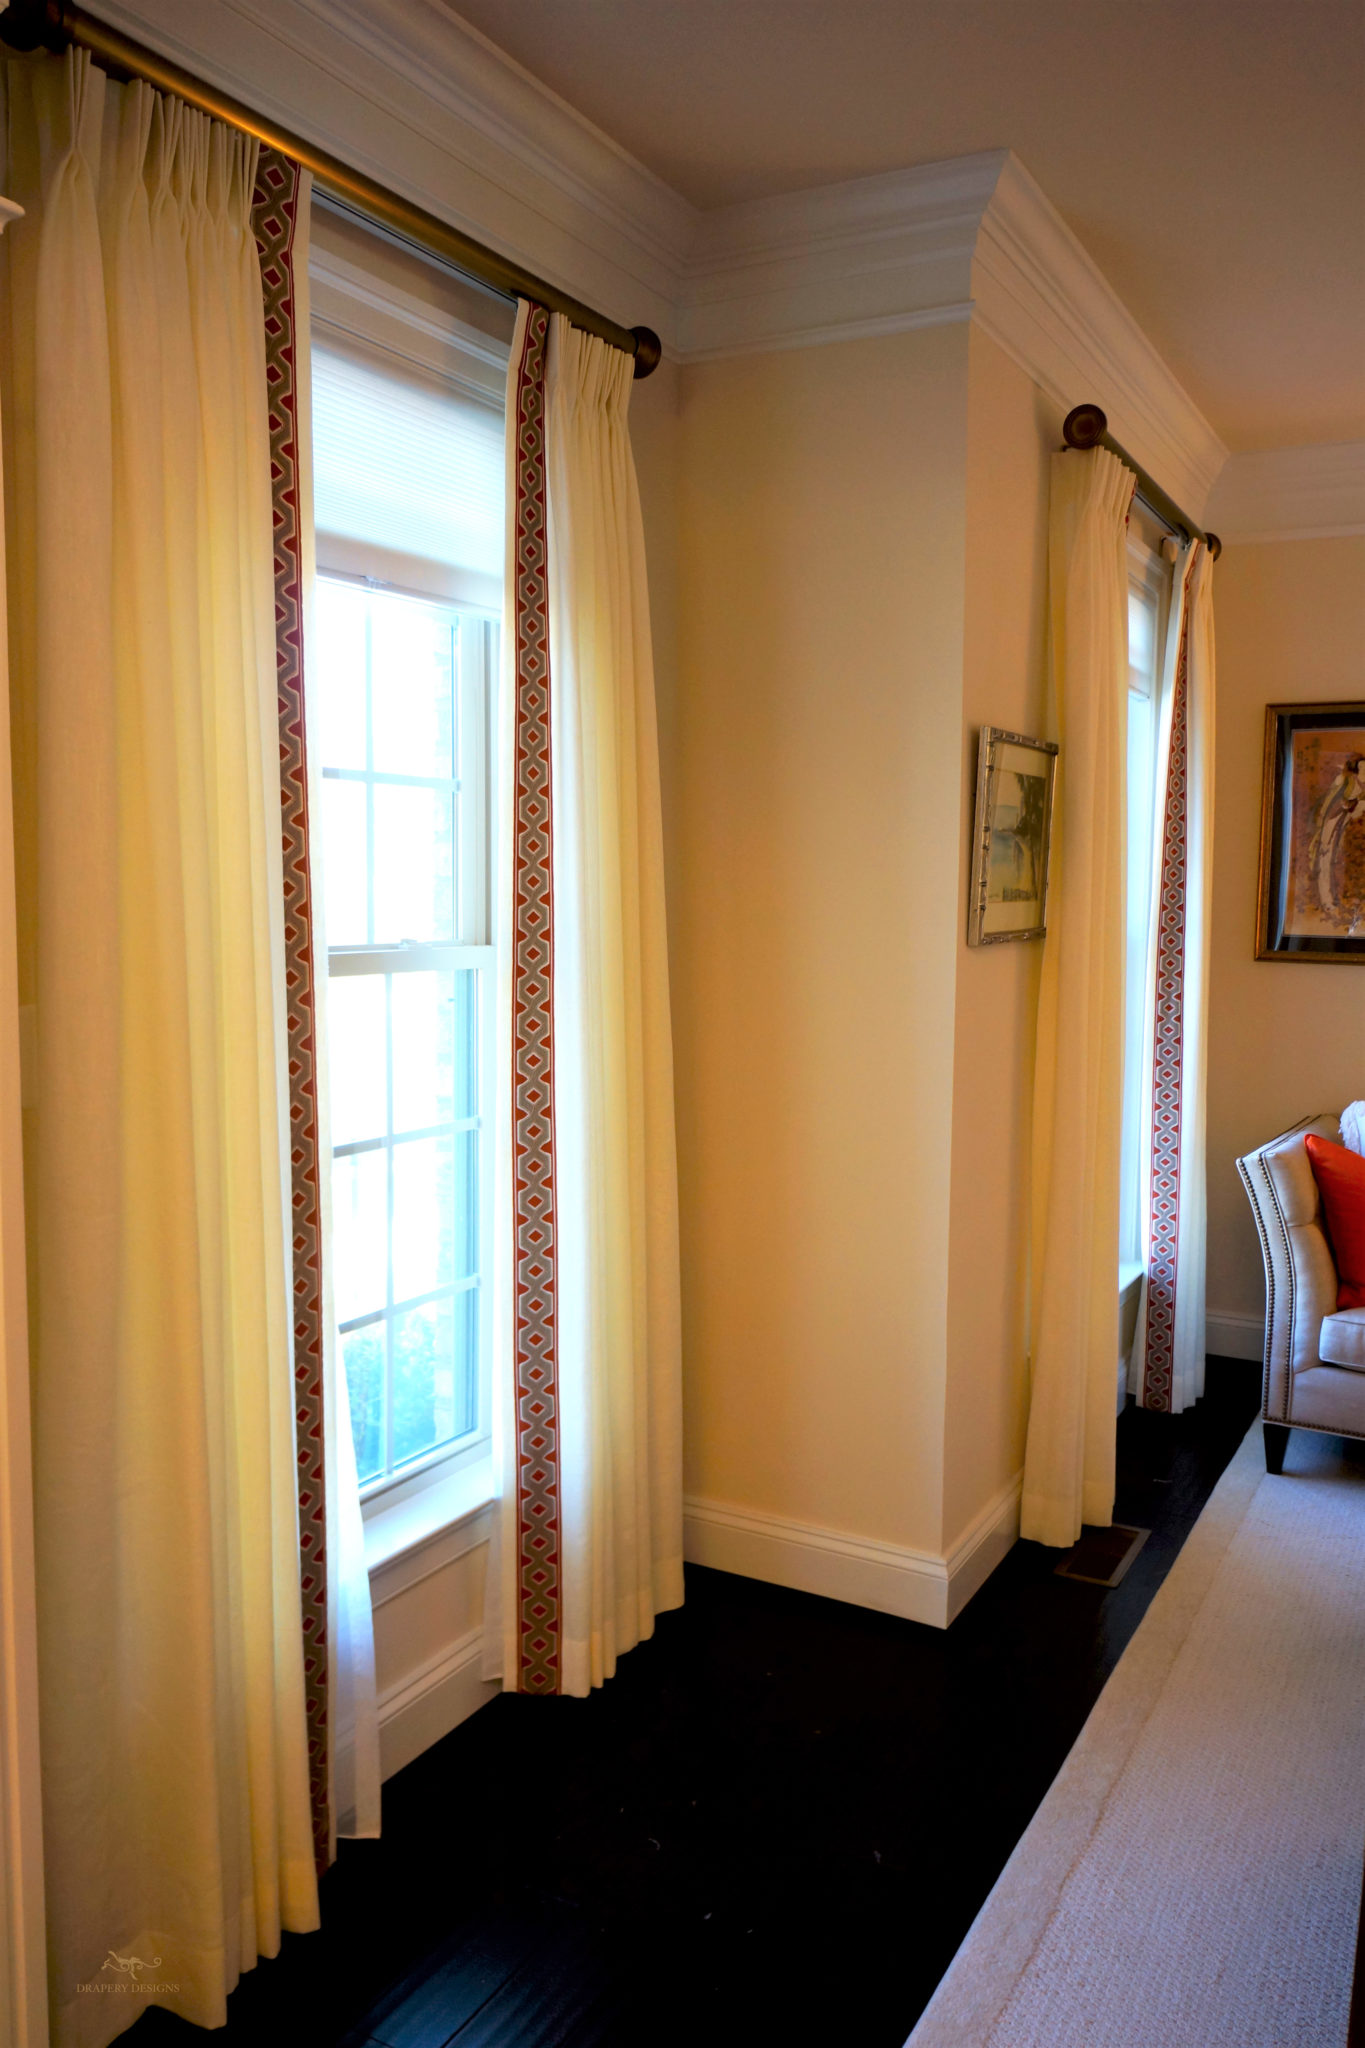 Drapery Designs Uncategorized 202004 Livingroomdrapes01